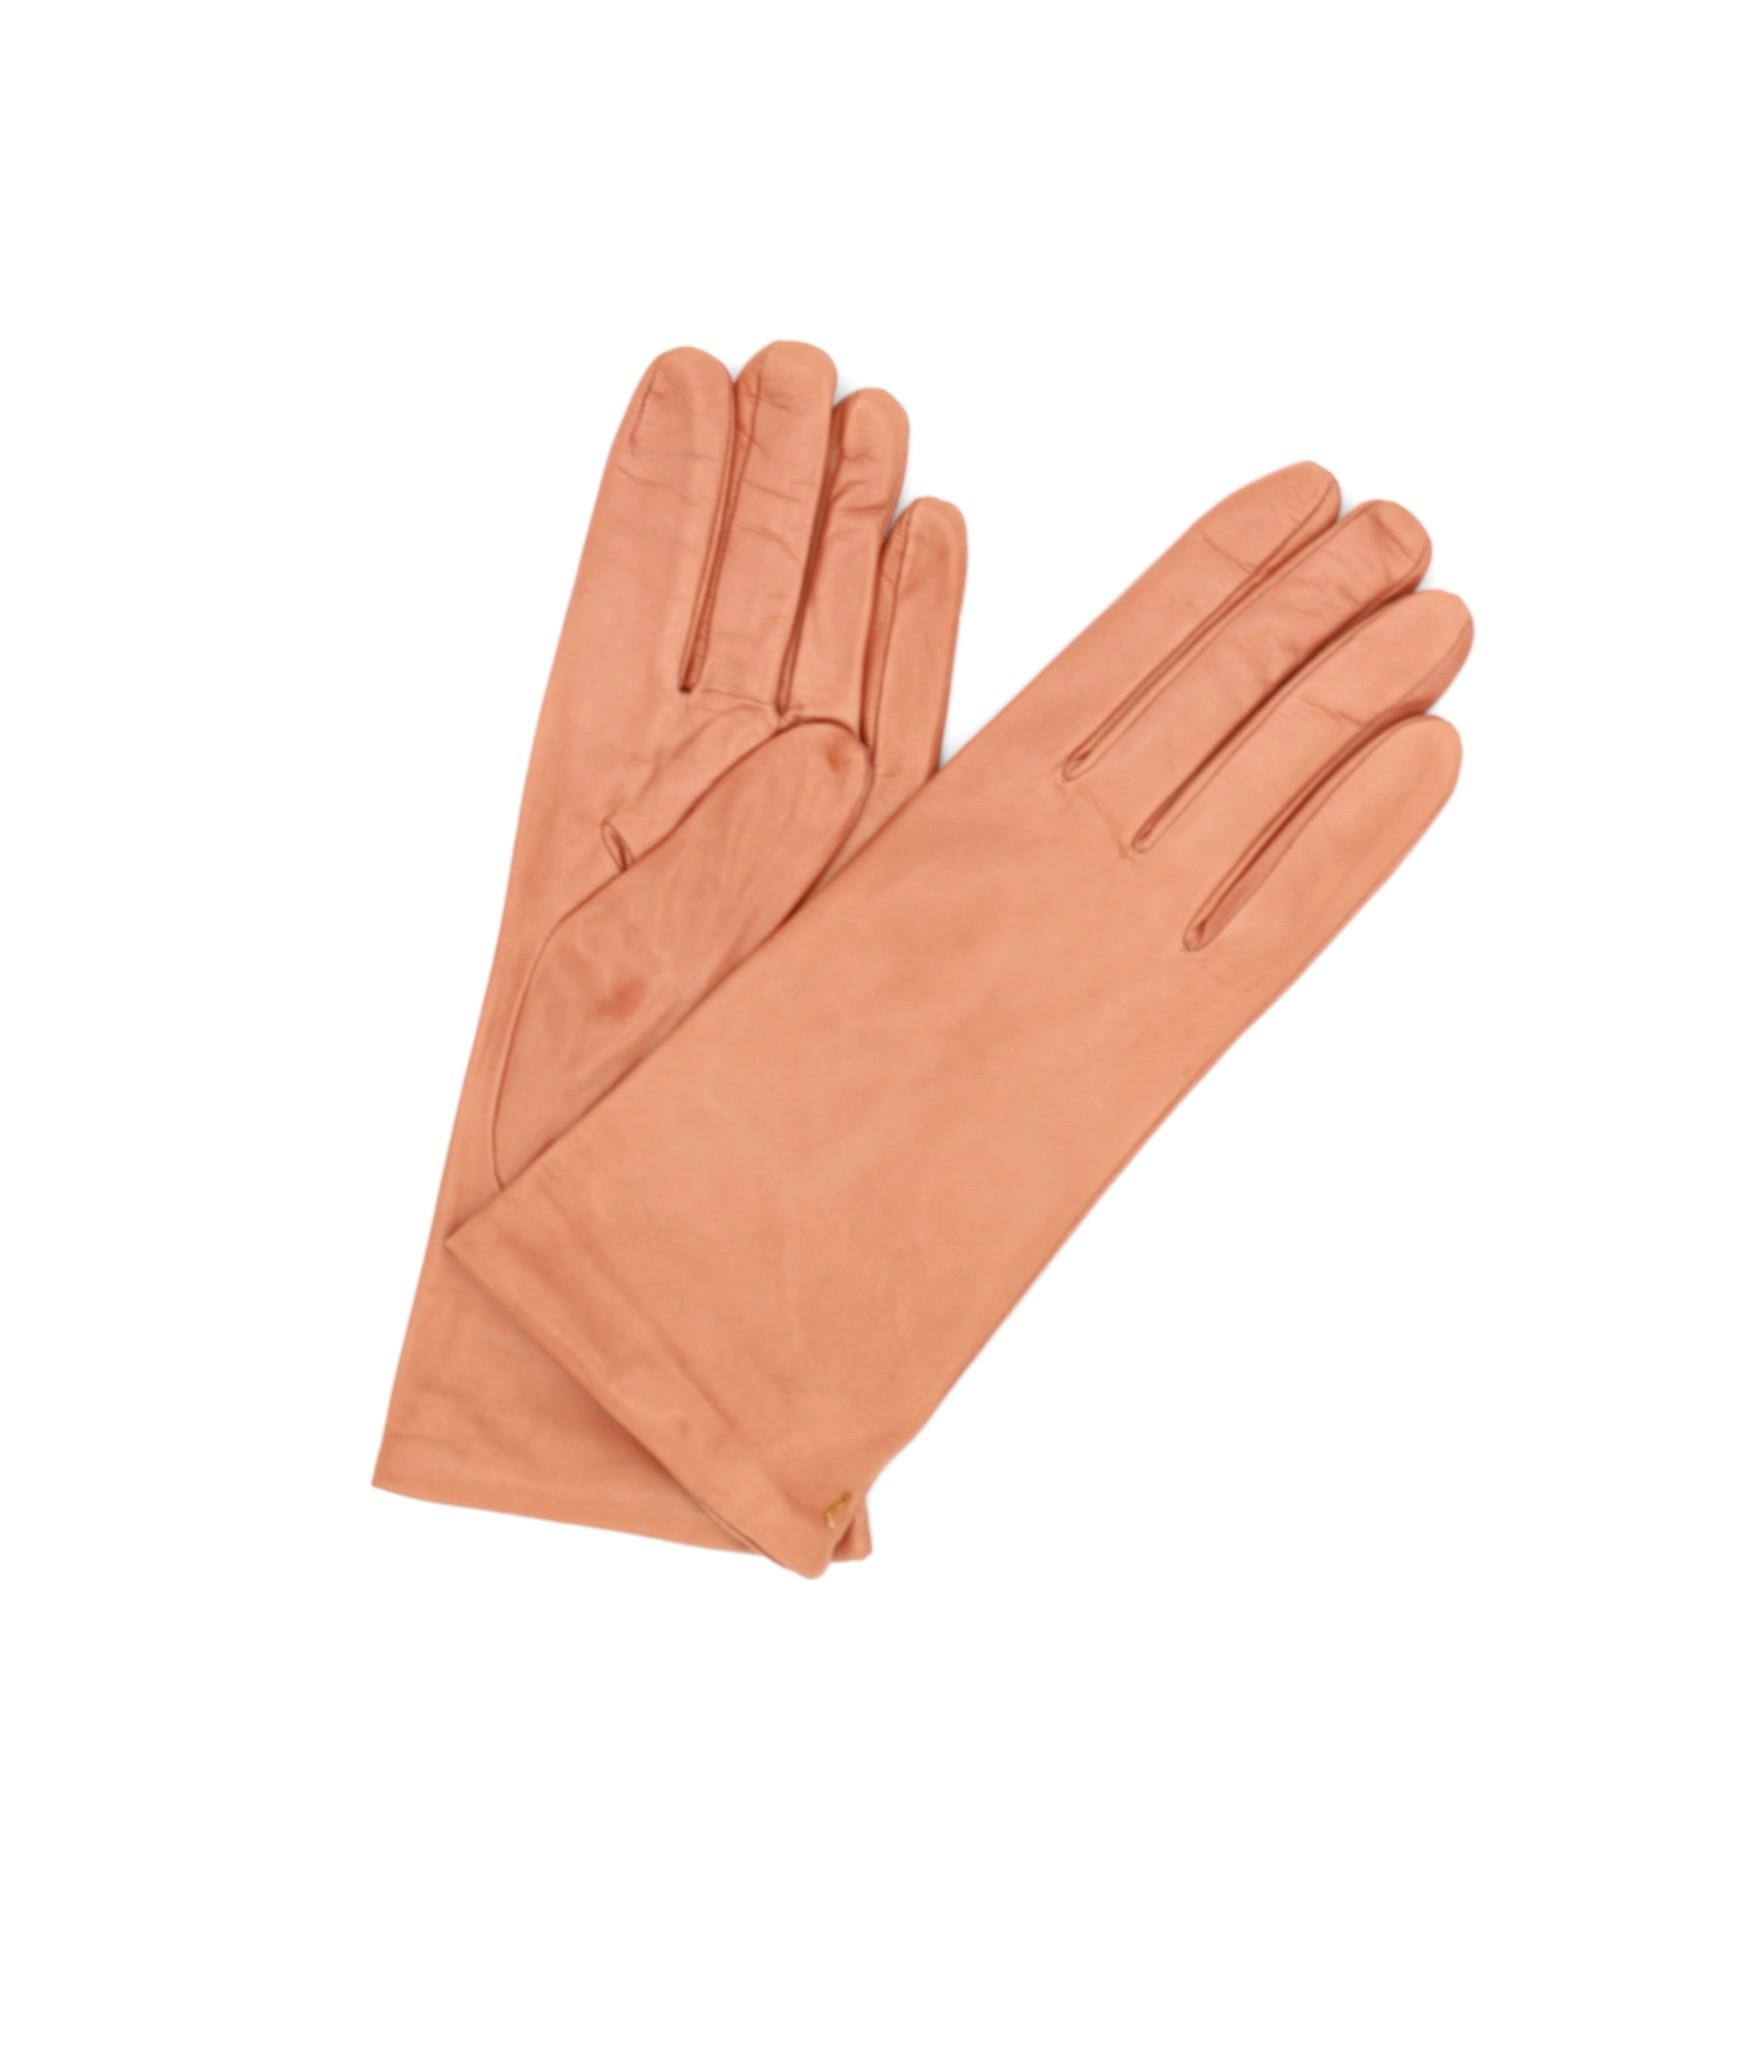 Nappa leather gloves Cashmere lined Salmon Pink Sermoneta